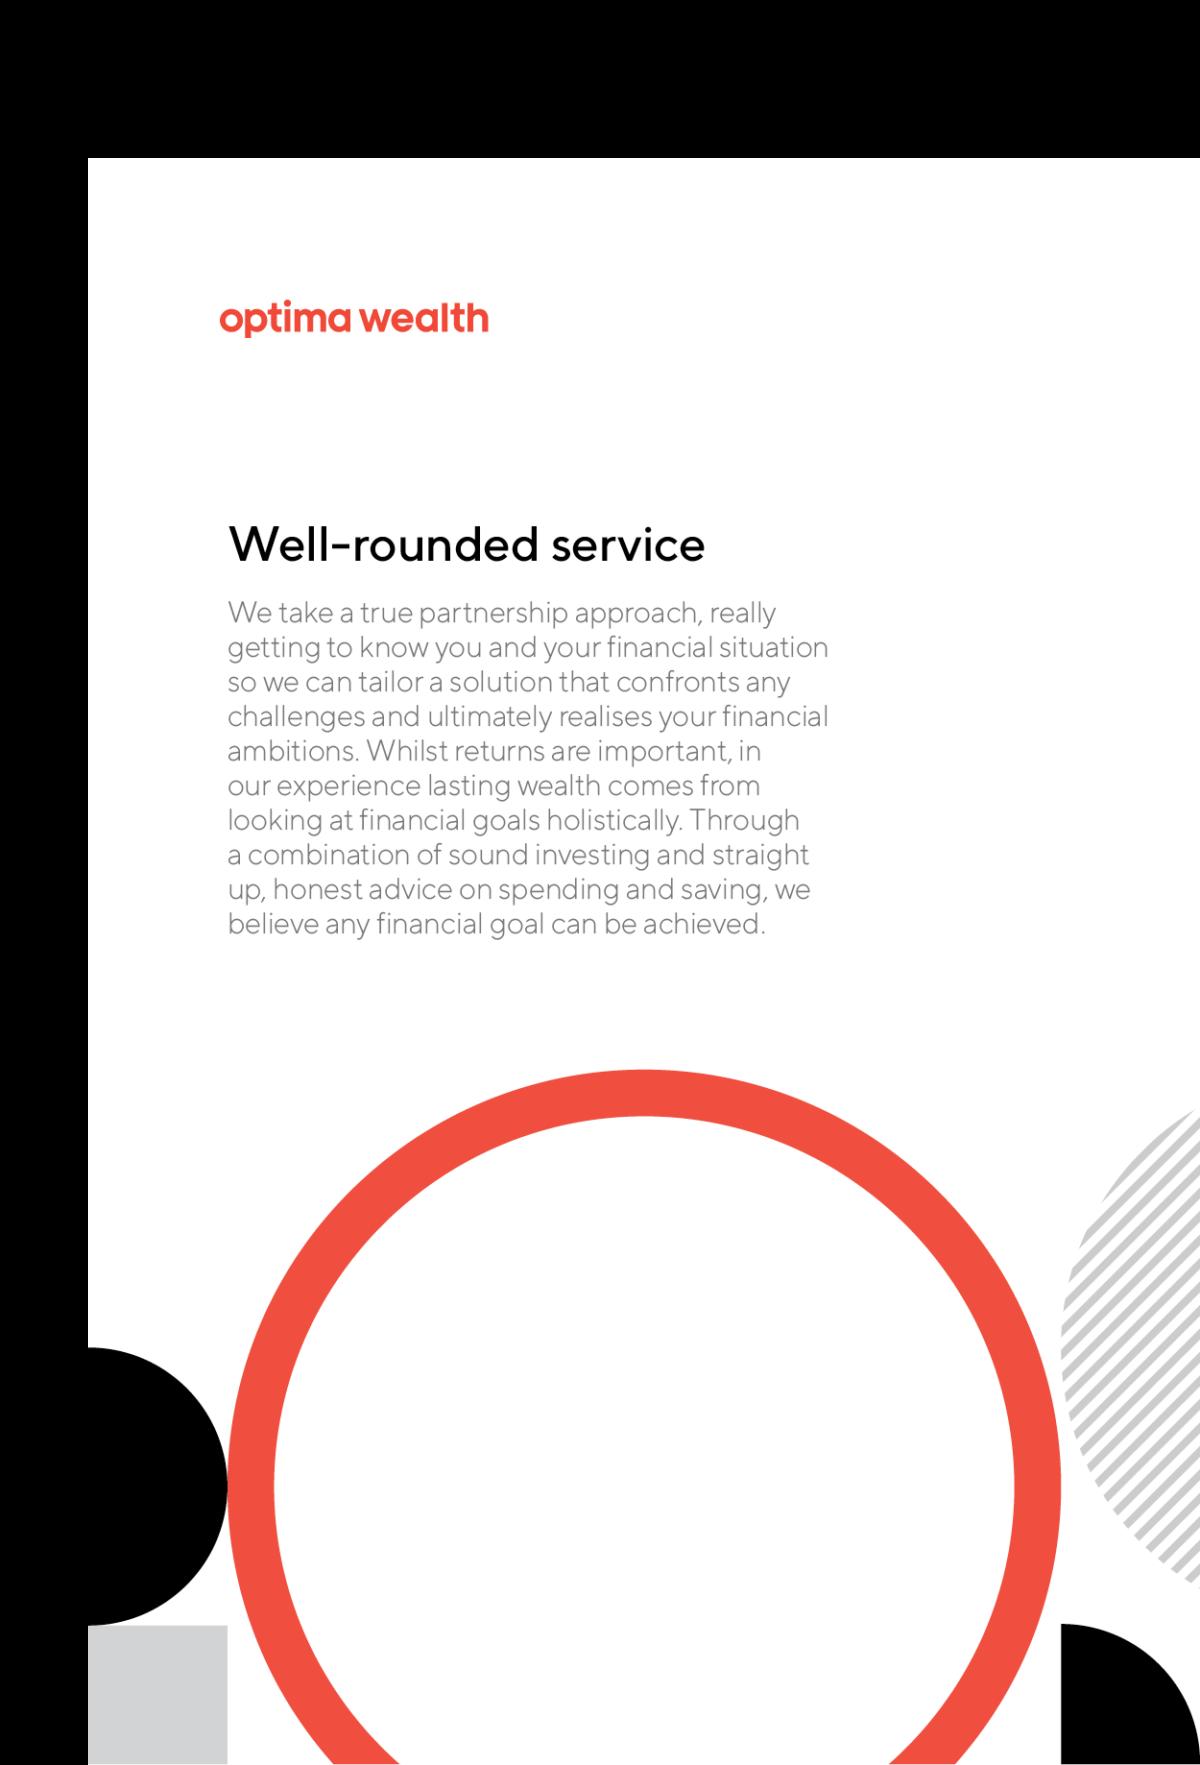 Optima Wealth Brand Images 2020 4